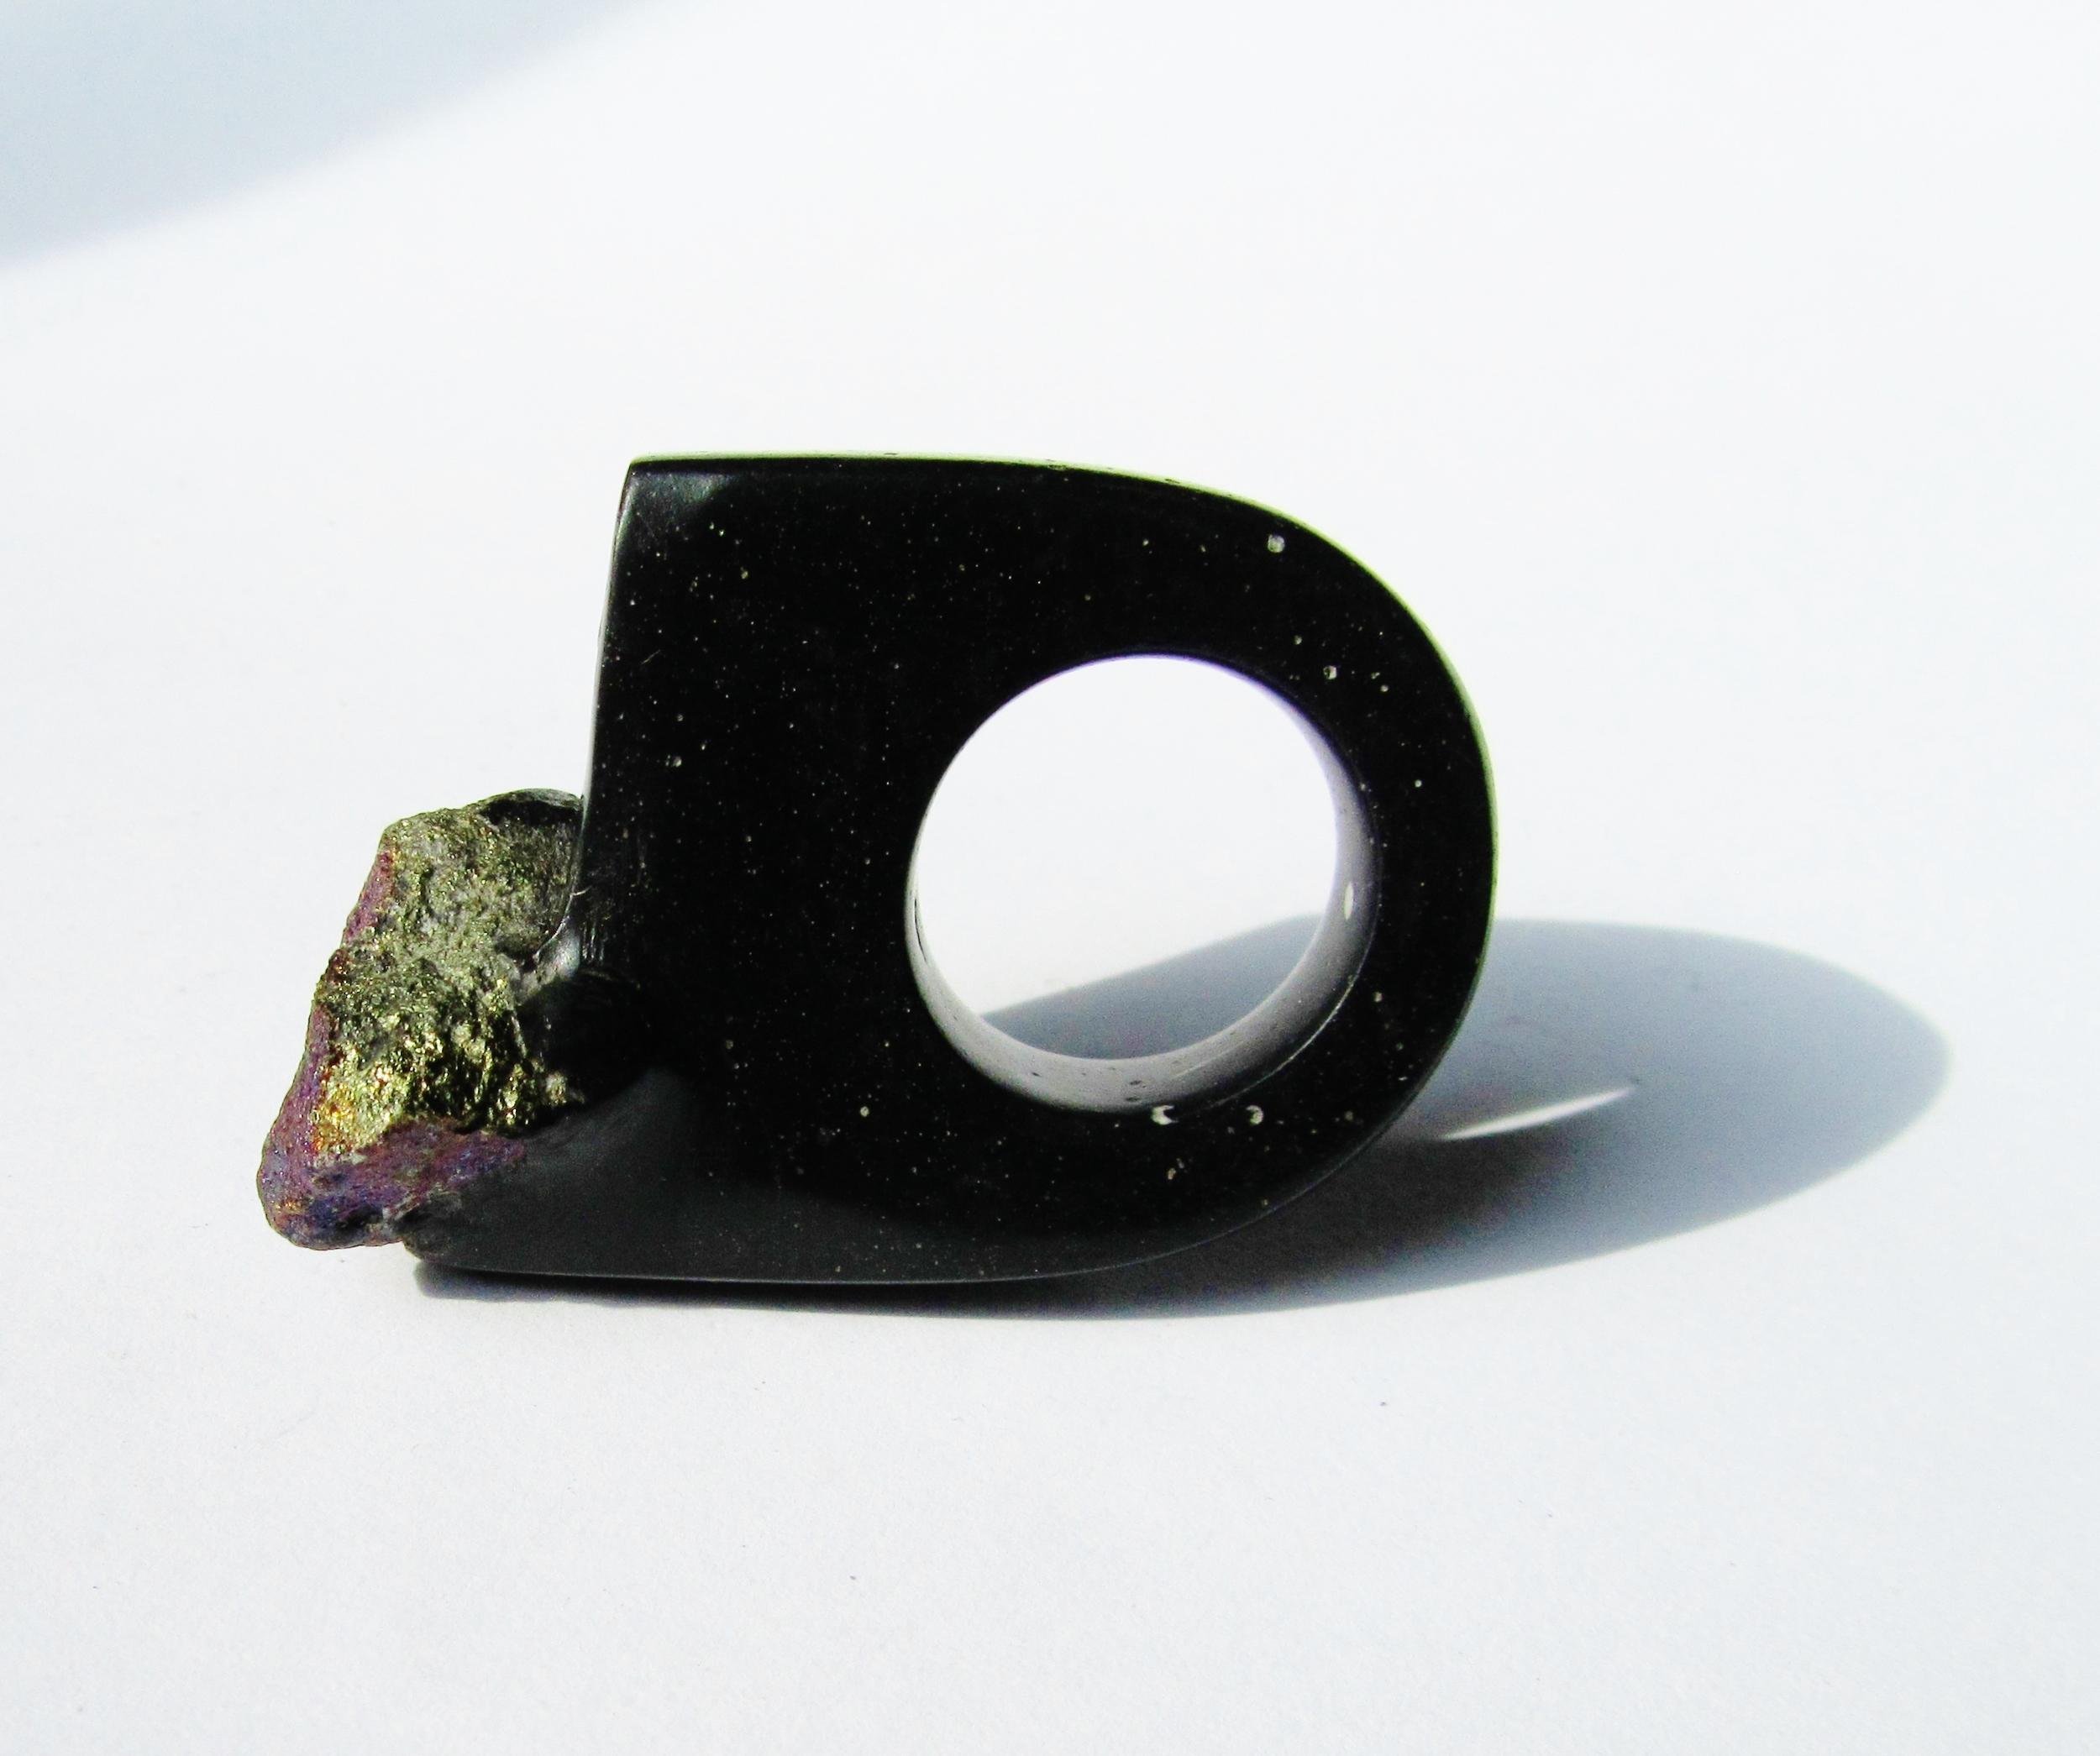 jade mellor hewn ring peacock ore black ring.JPG